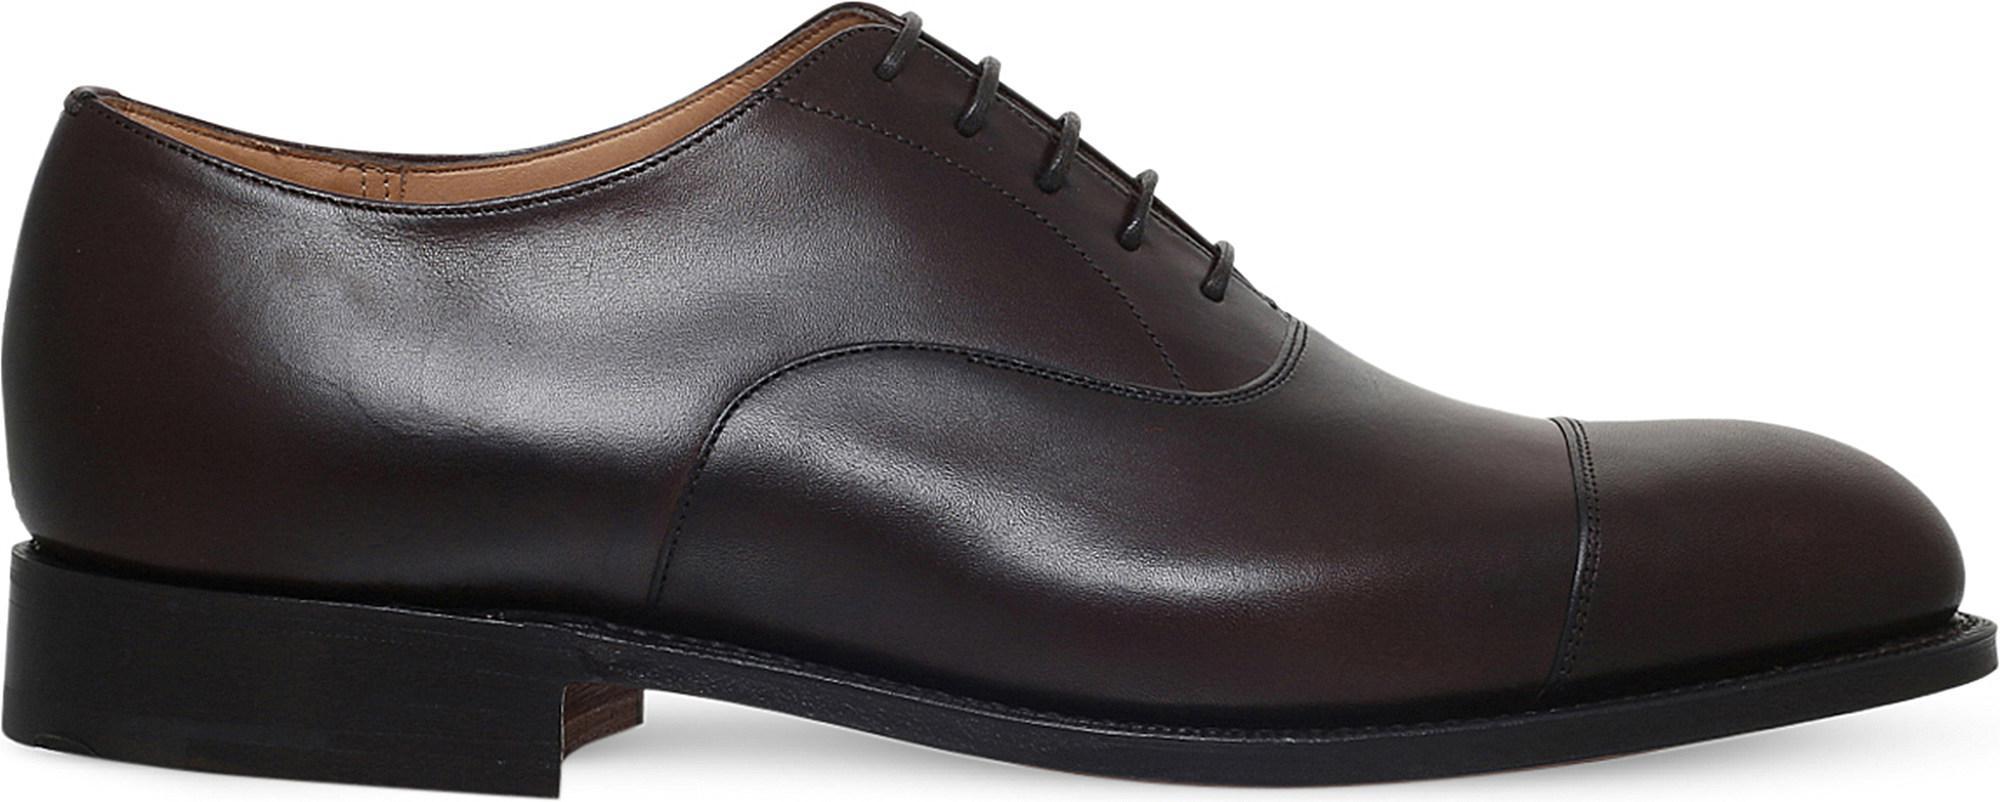 Church S Shoes Masterclass